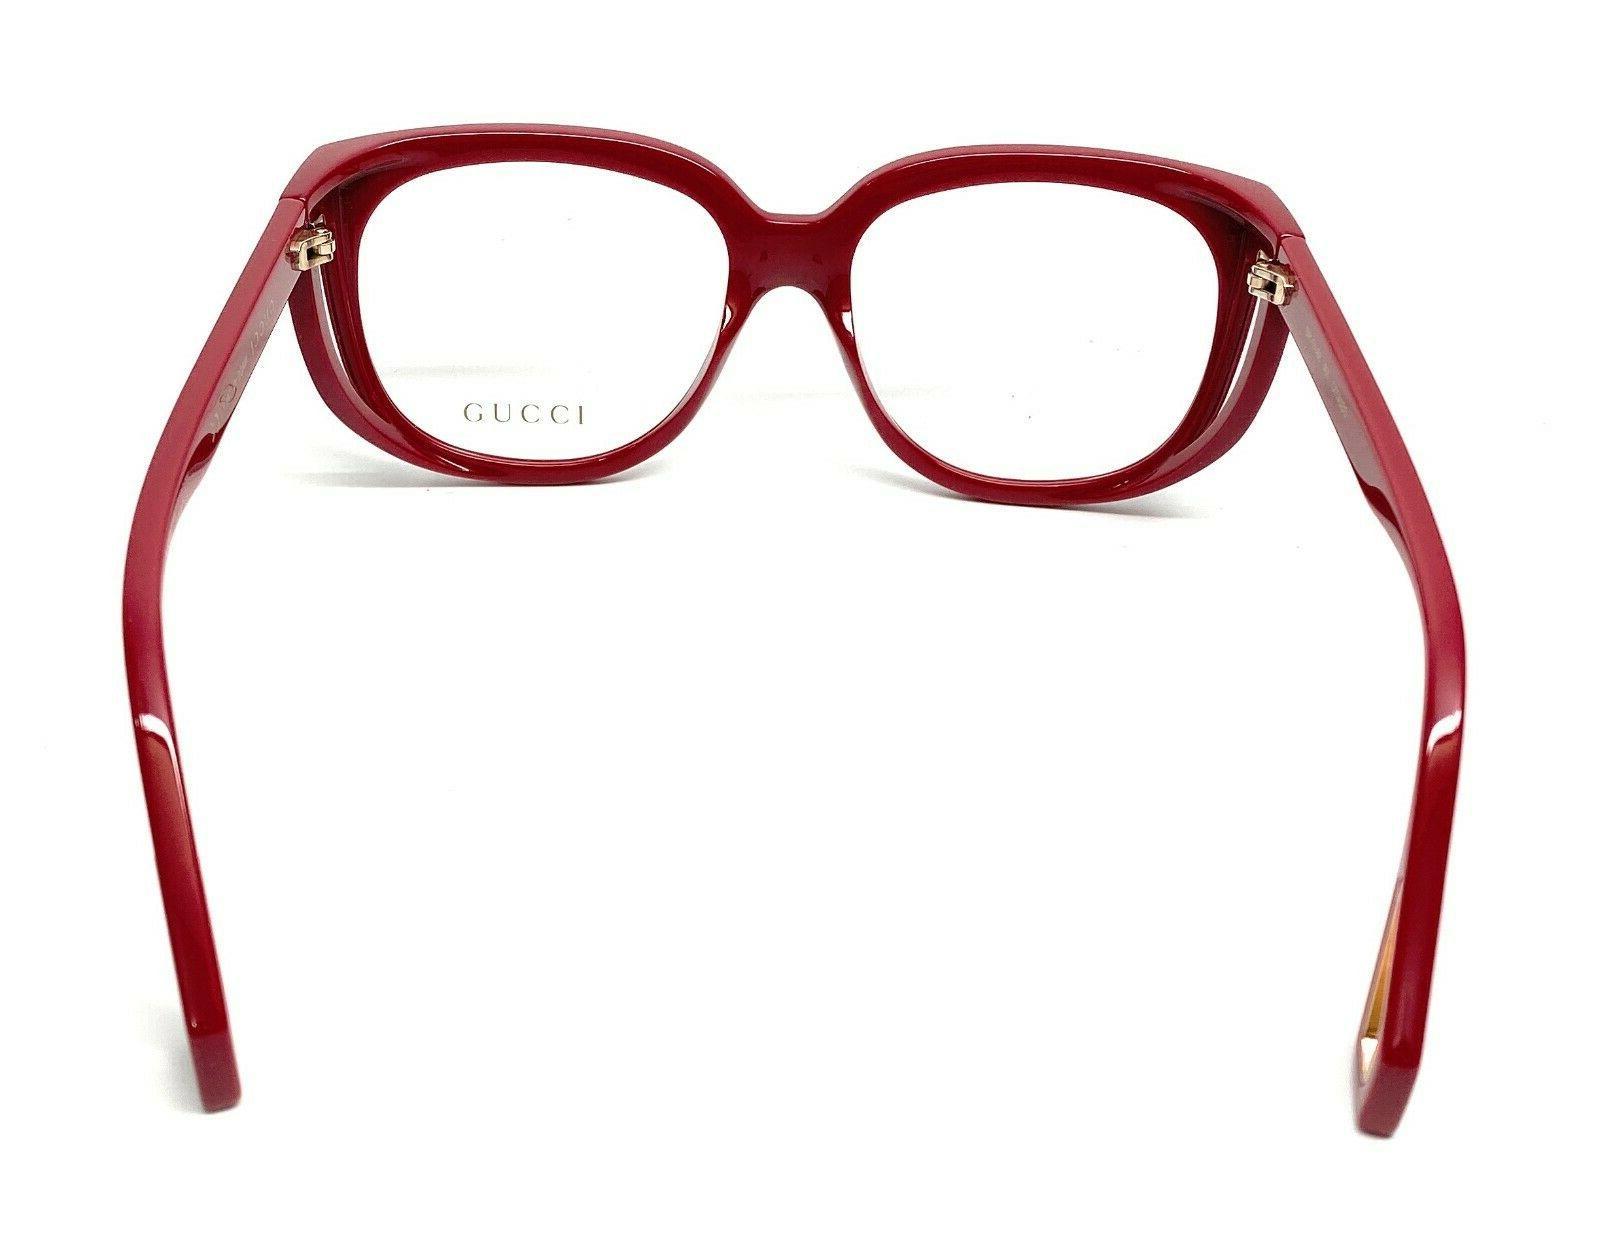 New Gucci 004 Burgundy Women's Eyeglasses Frame